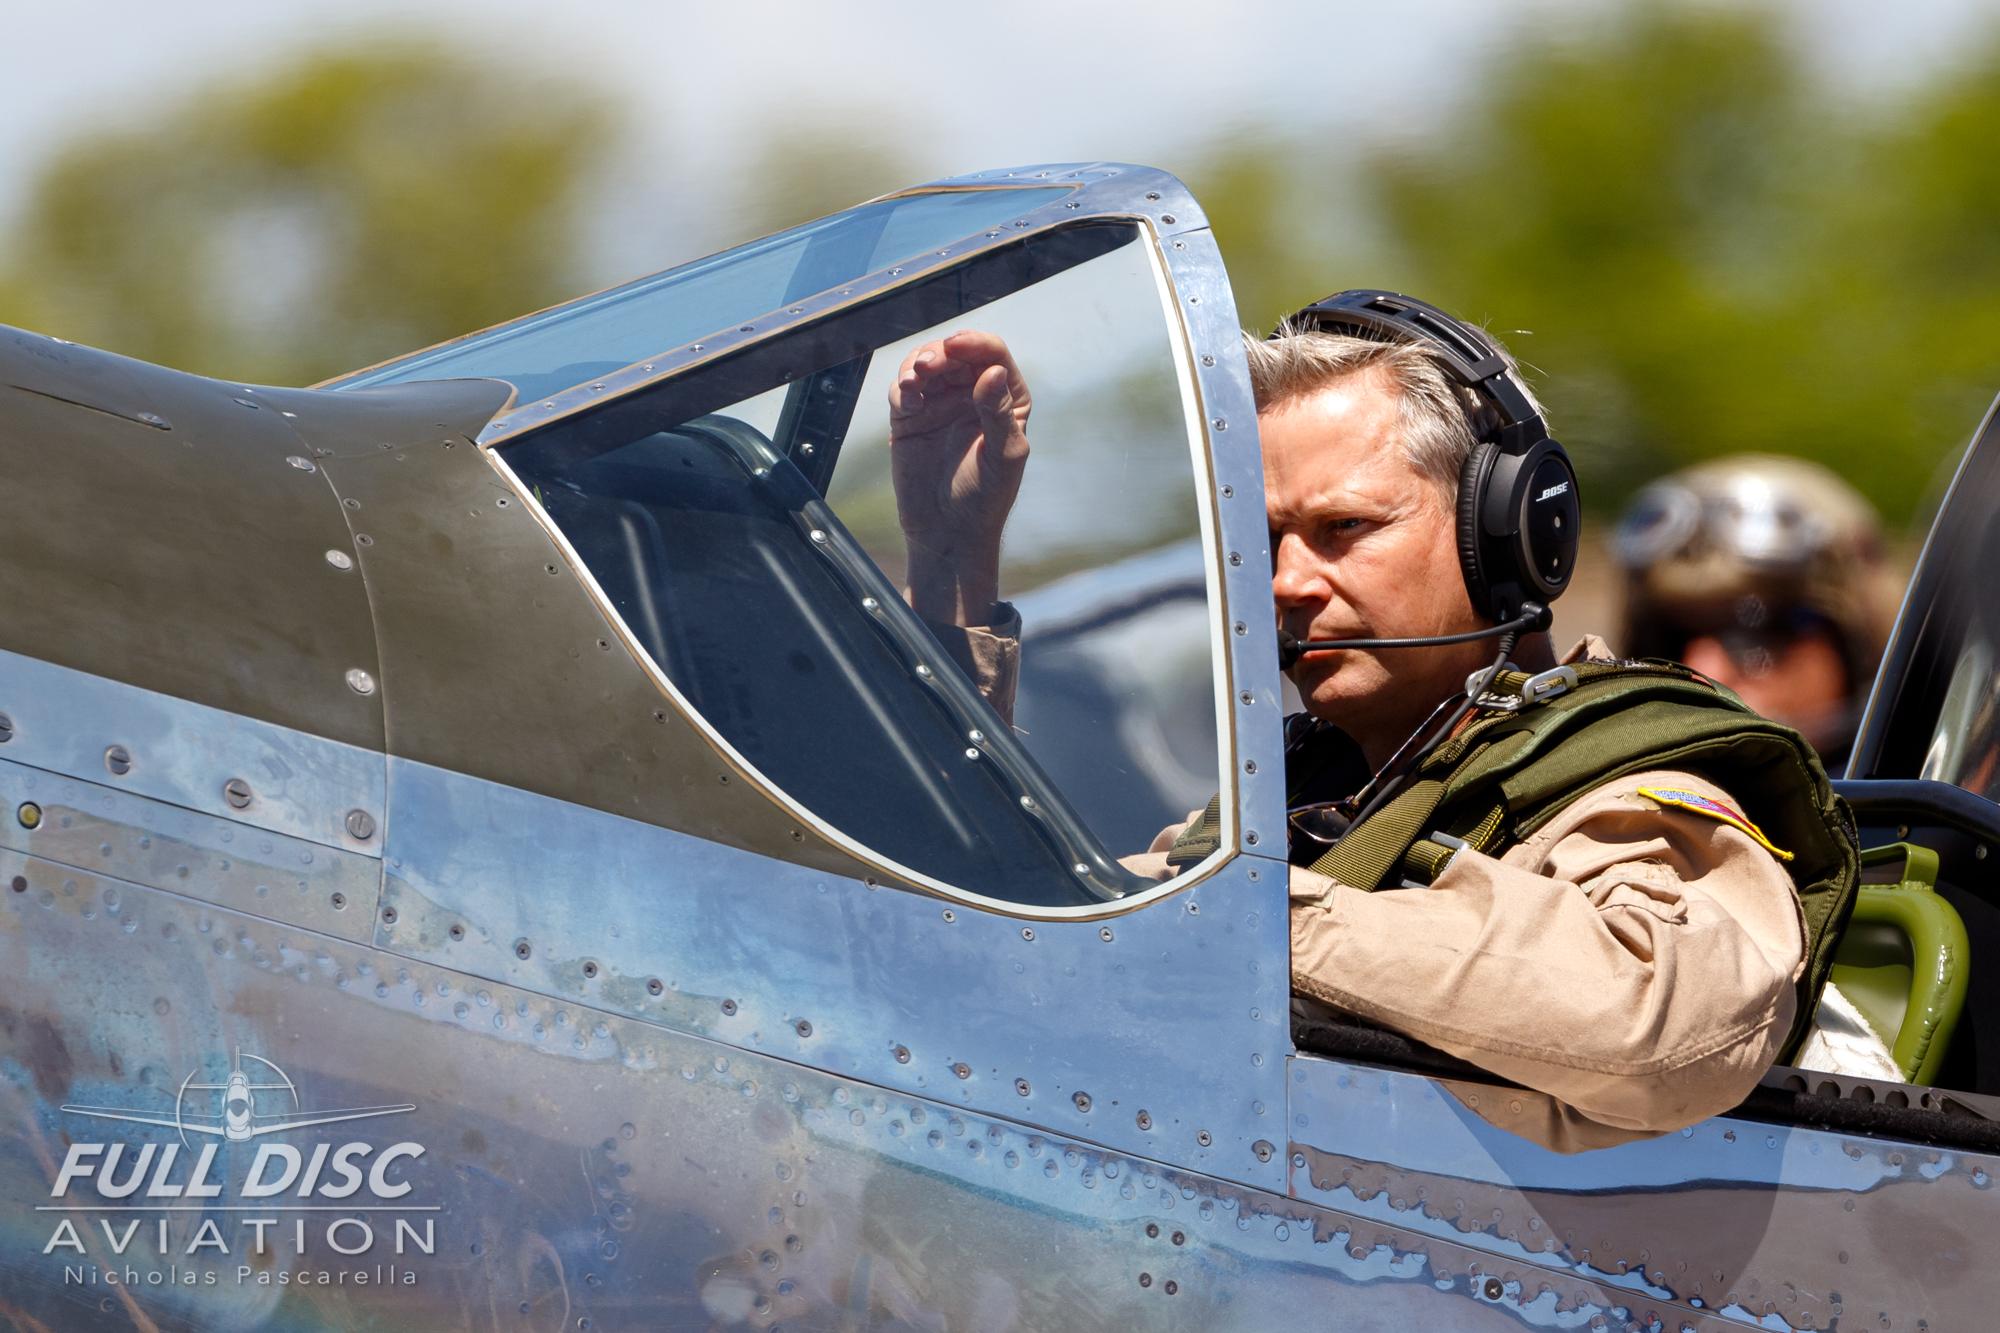 americanairpowermuseum_nicholaspascarella_nickpascarella_fulldiscaviation_legendsofairpower2019_aviation_warbird_markmurphy_pilot_thomrichard_p51mustang.jpg